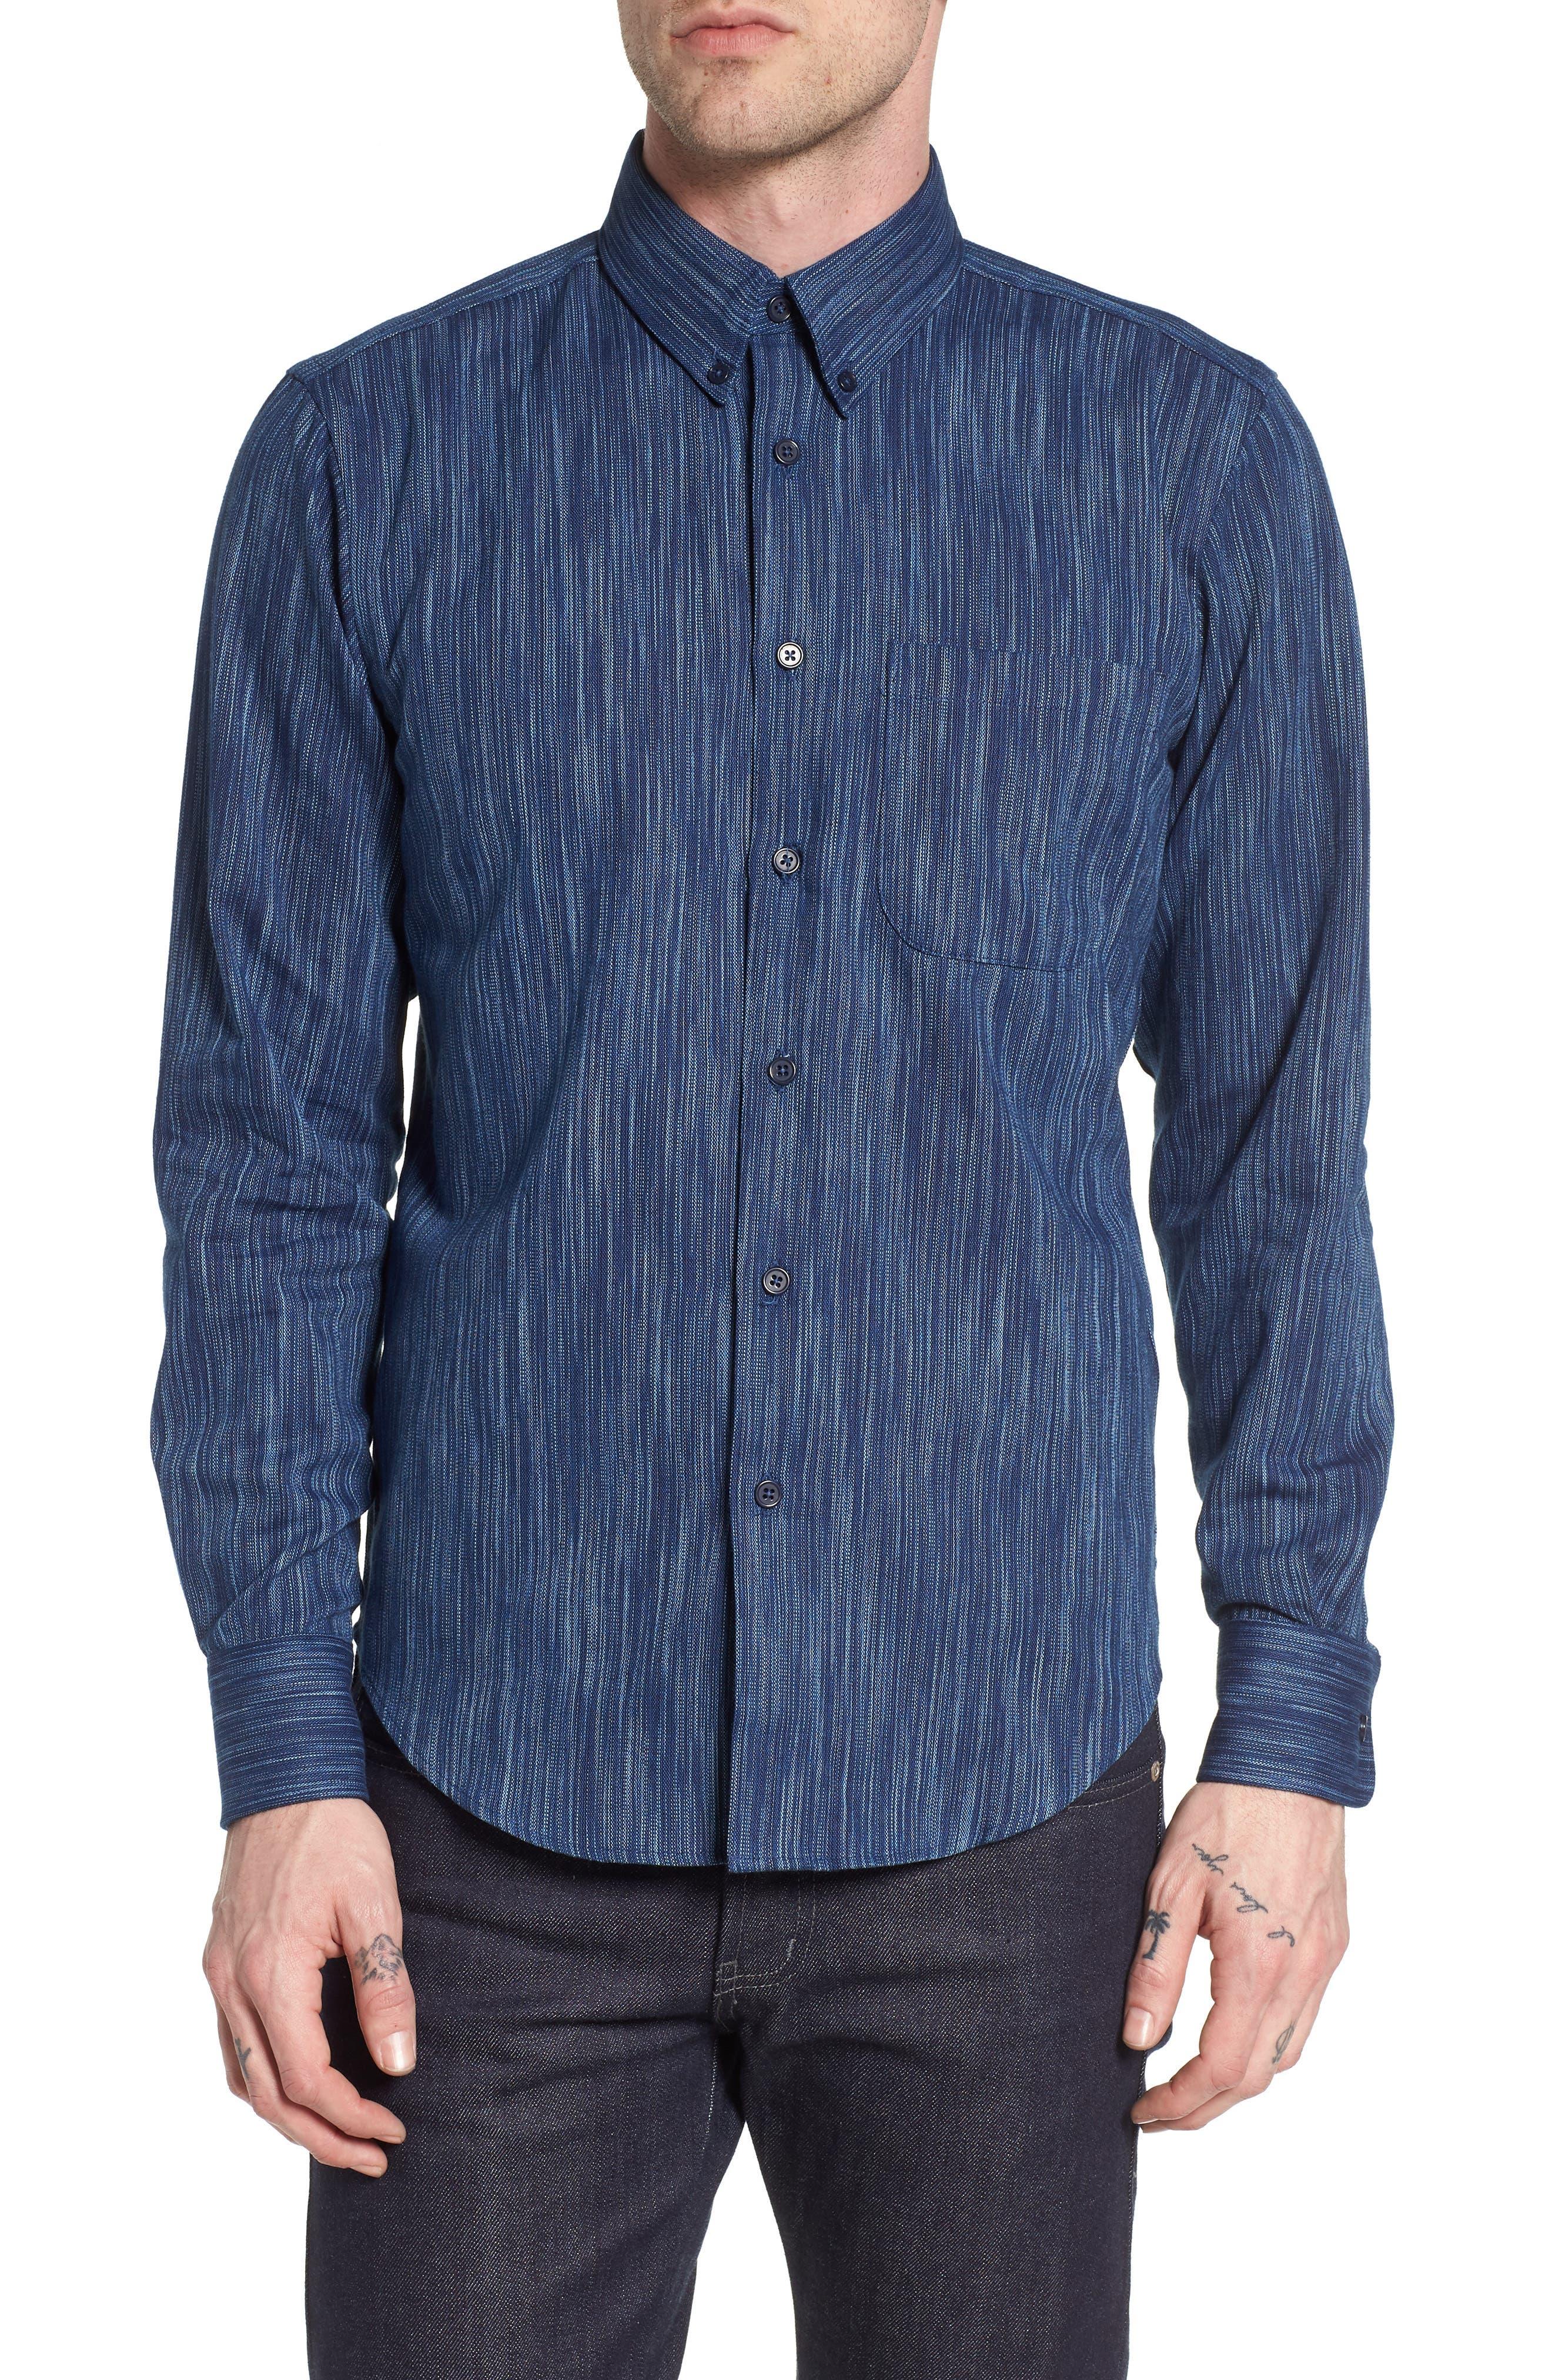 Indigo Tie Dye Rain Weave Shirt,                         Main,                         color, Blue